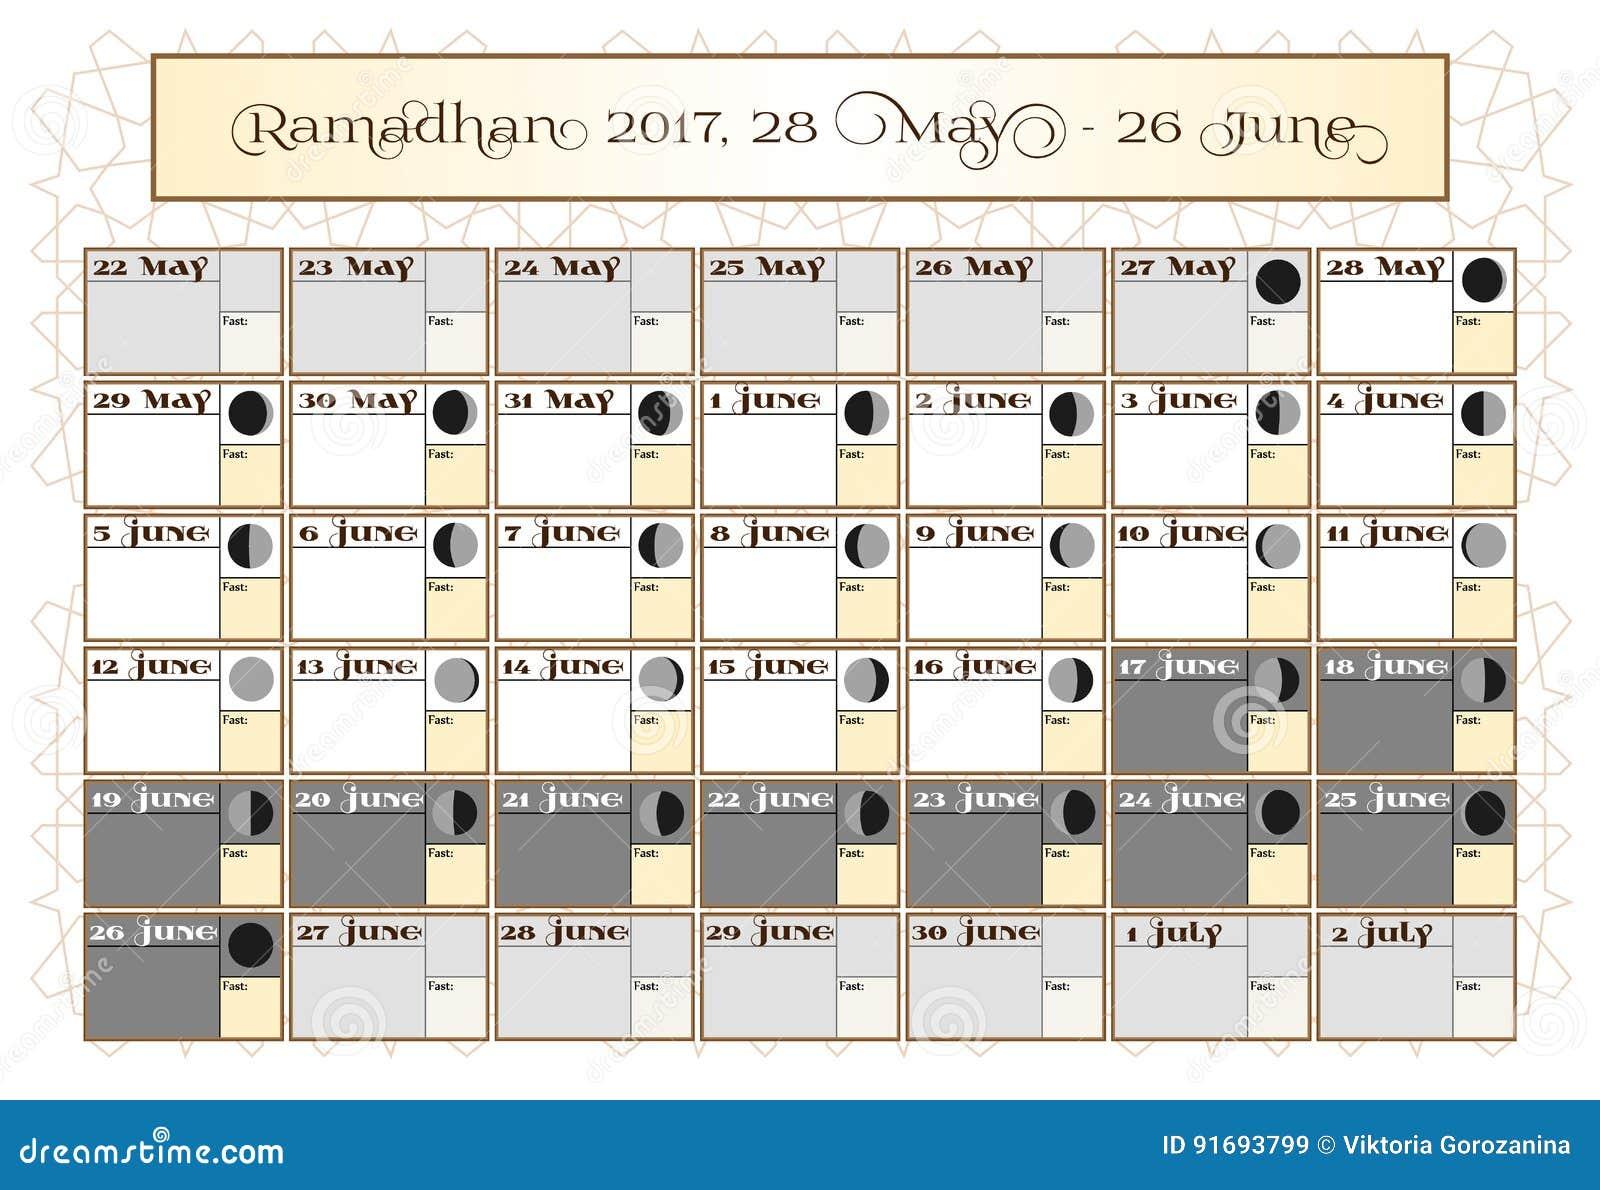 calendrier 2017 de ramadan le 28 mai v rifiez le choix de. Black Bedroom Furniture Sets. Home Design Ideas